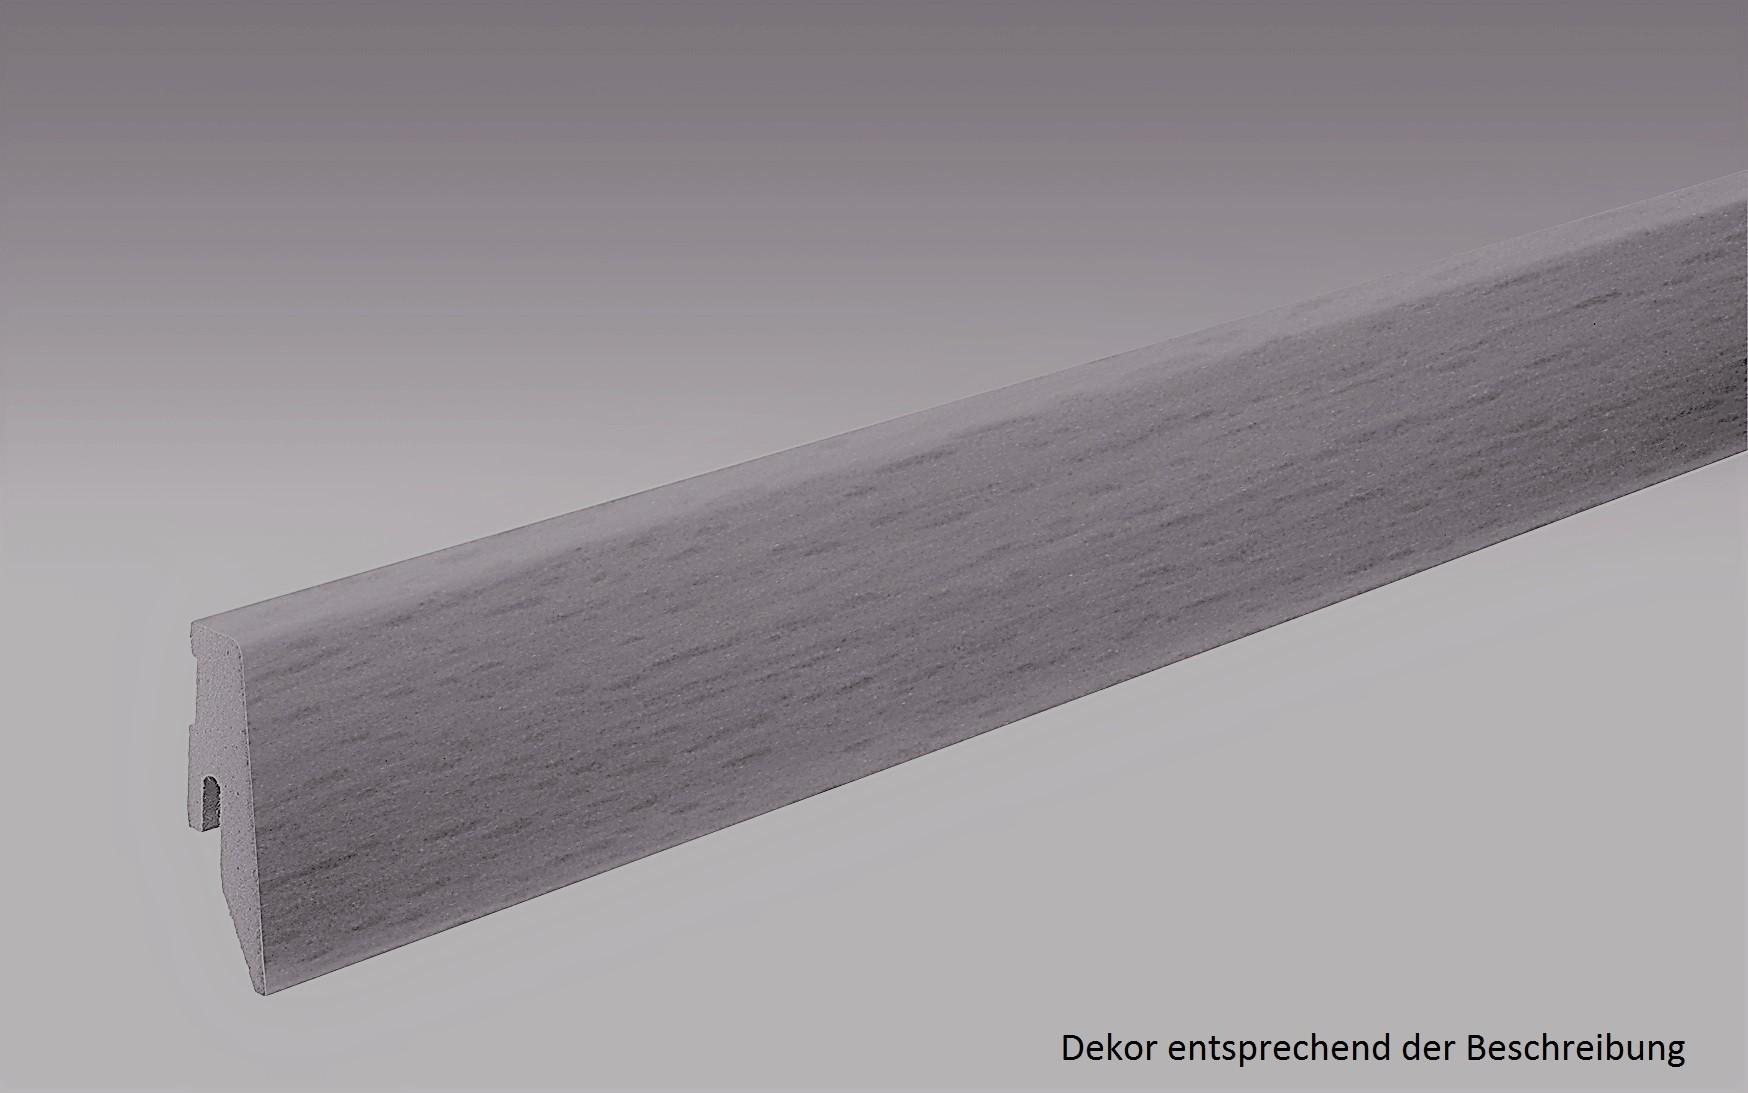 Eiche Long Beach Fußleiste Profil 3 PK (2500 x 20 x 60 mm) - MEISTER